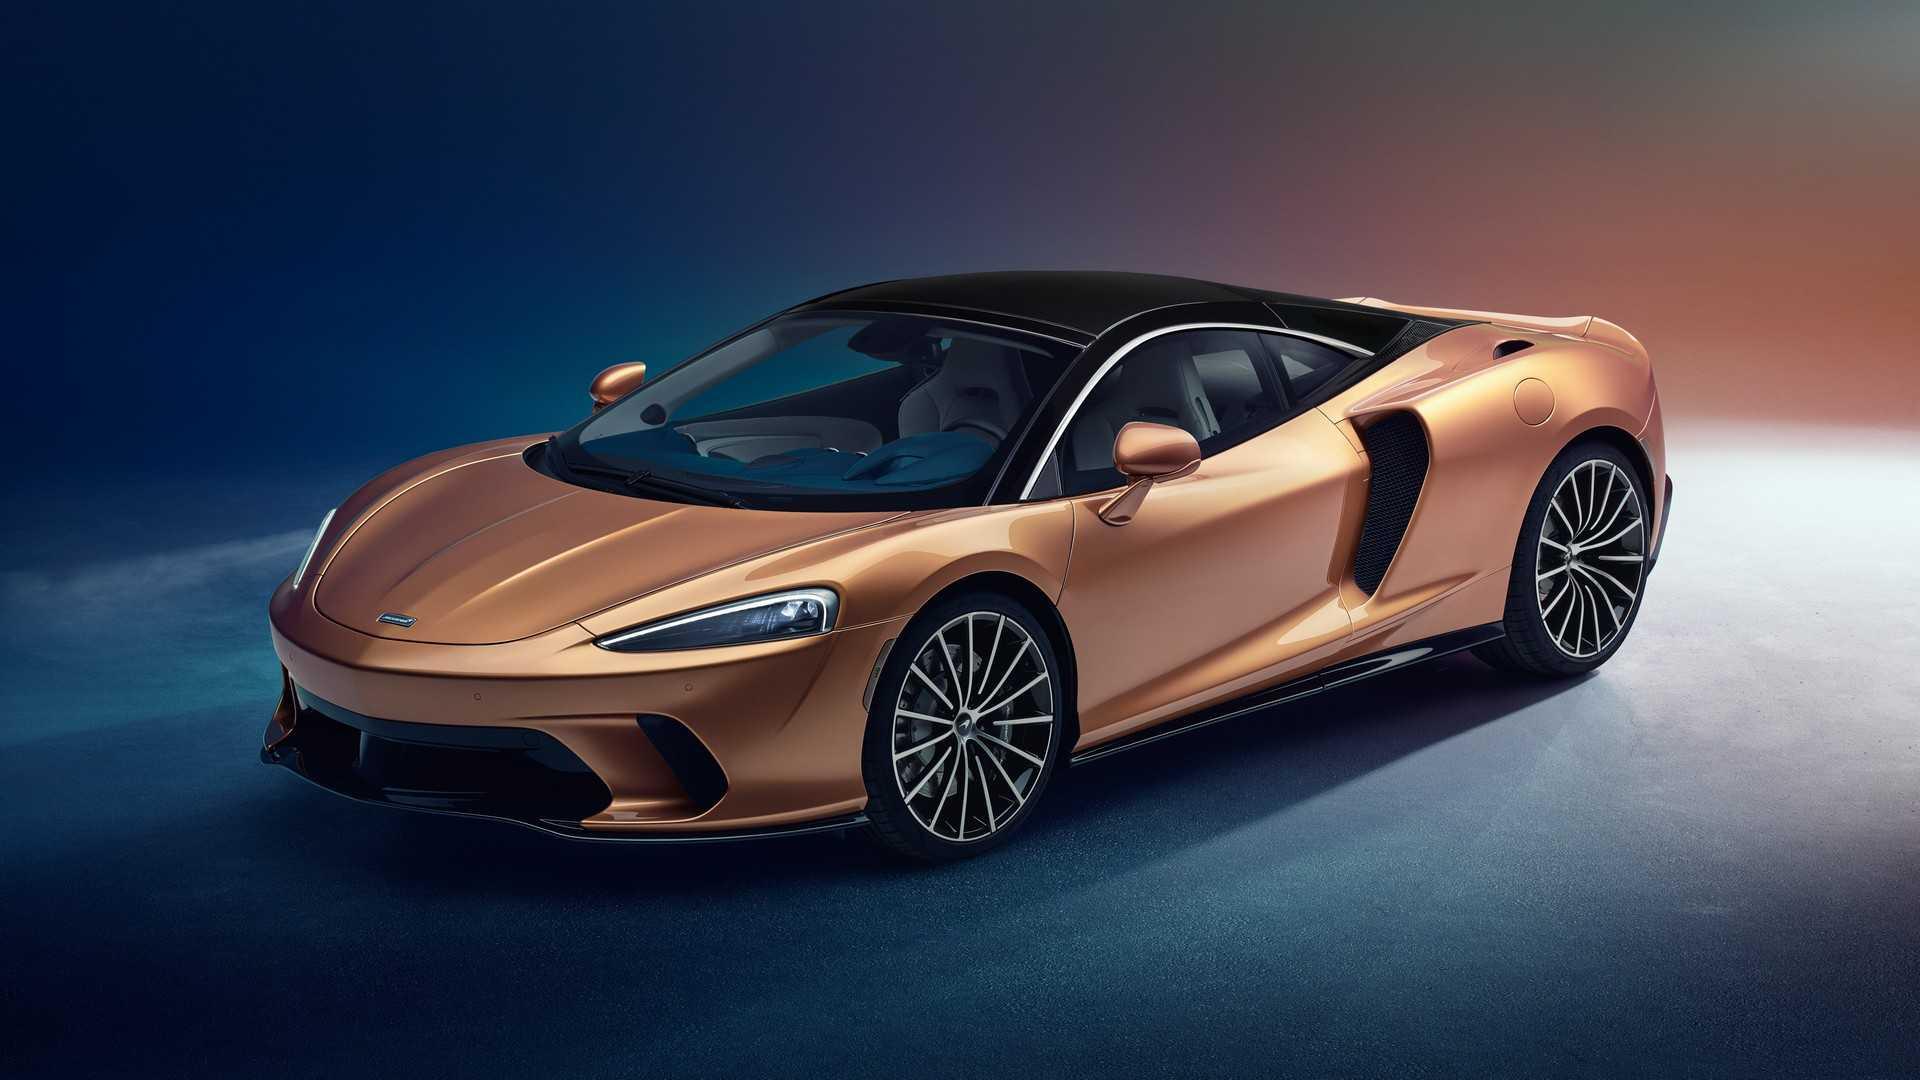 GT 2020، به راحتترین و جادارترین مکلارن جهان